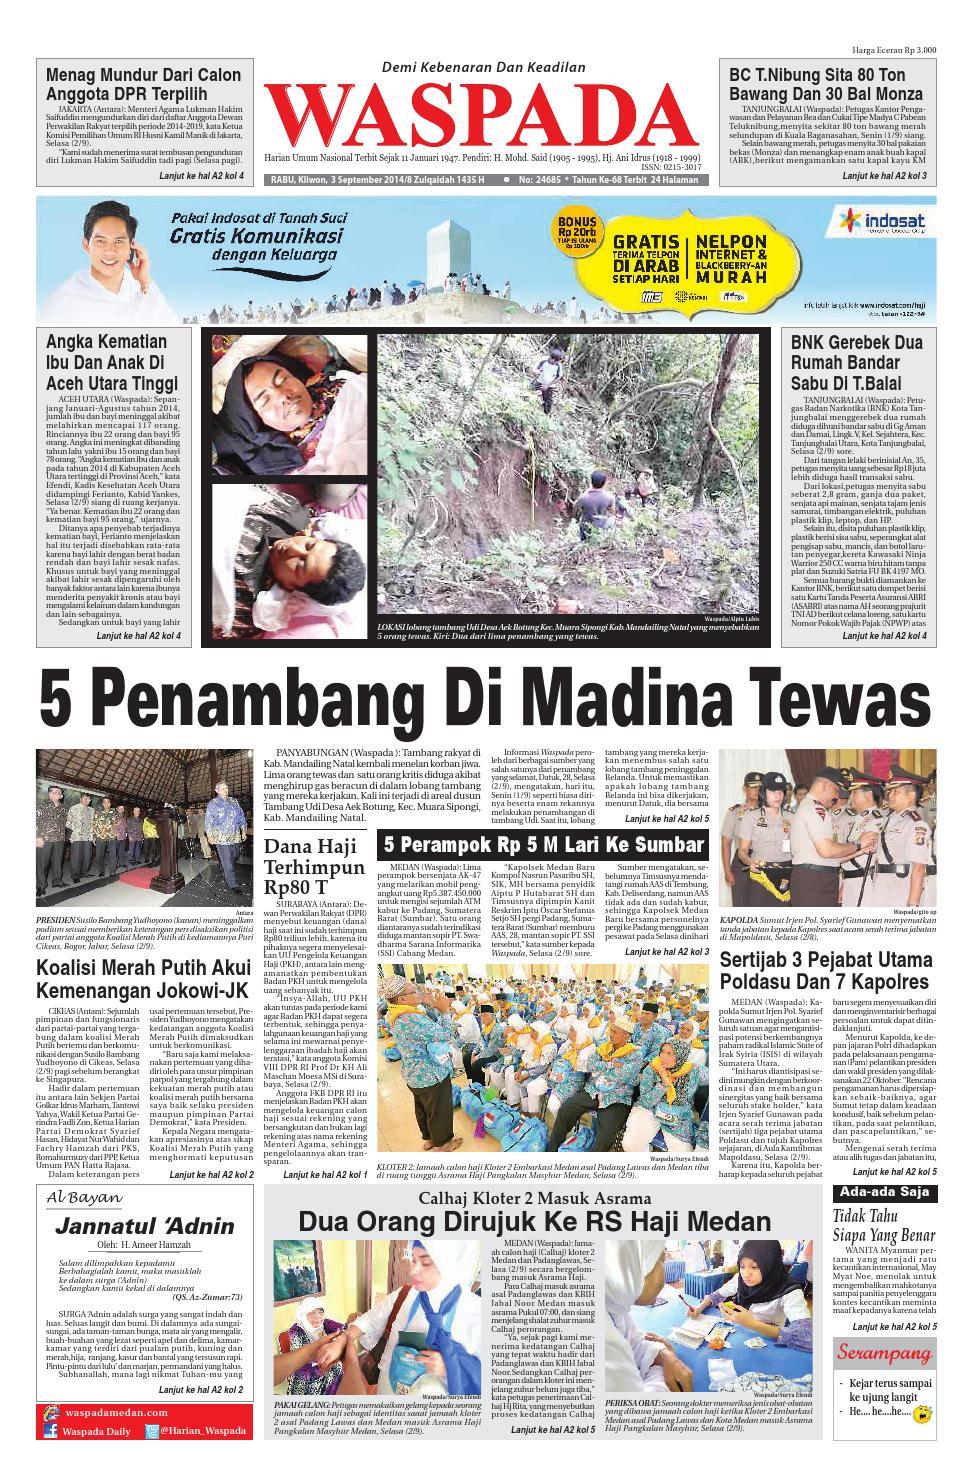 Waspadarabu 3 September 2014 By Harian Waspada Issuu Produk Ukm Bumn Kain Batik Middle Premium Sutera